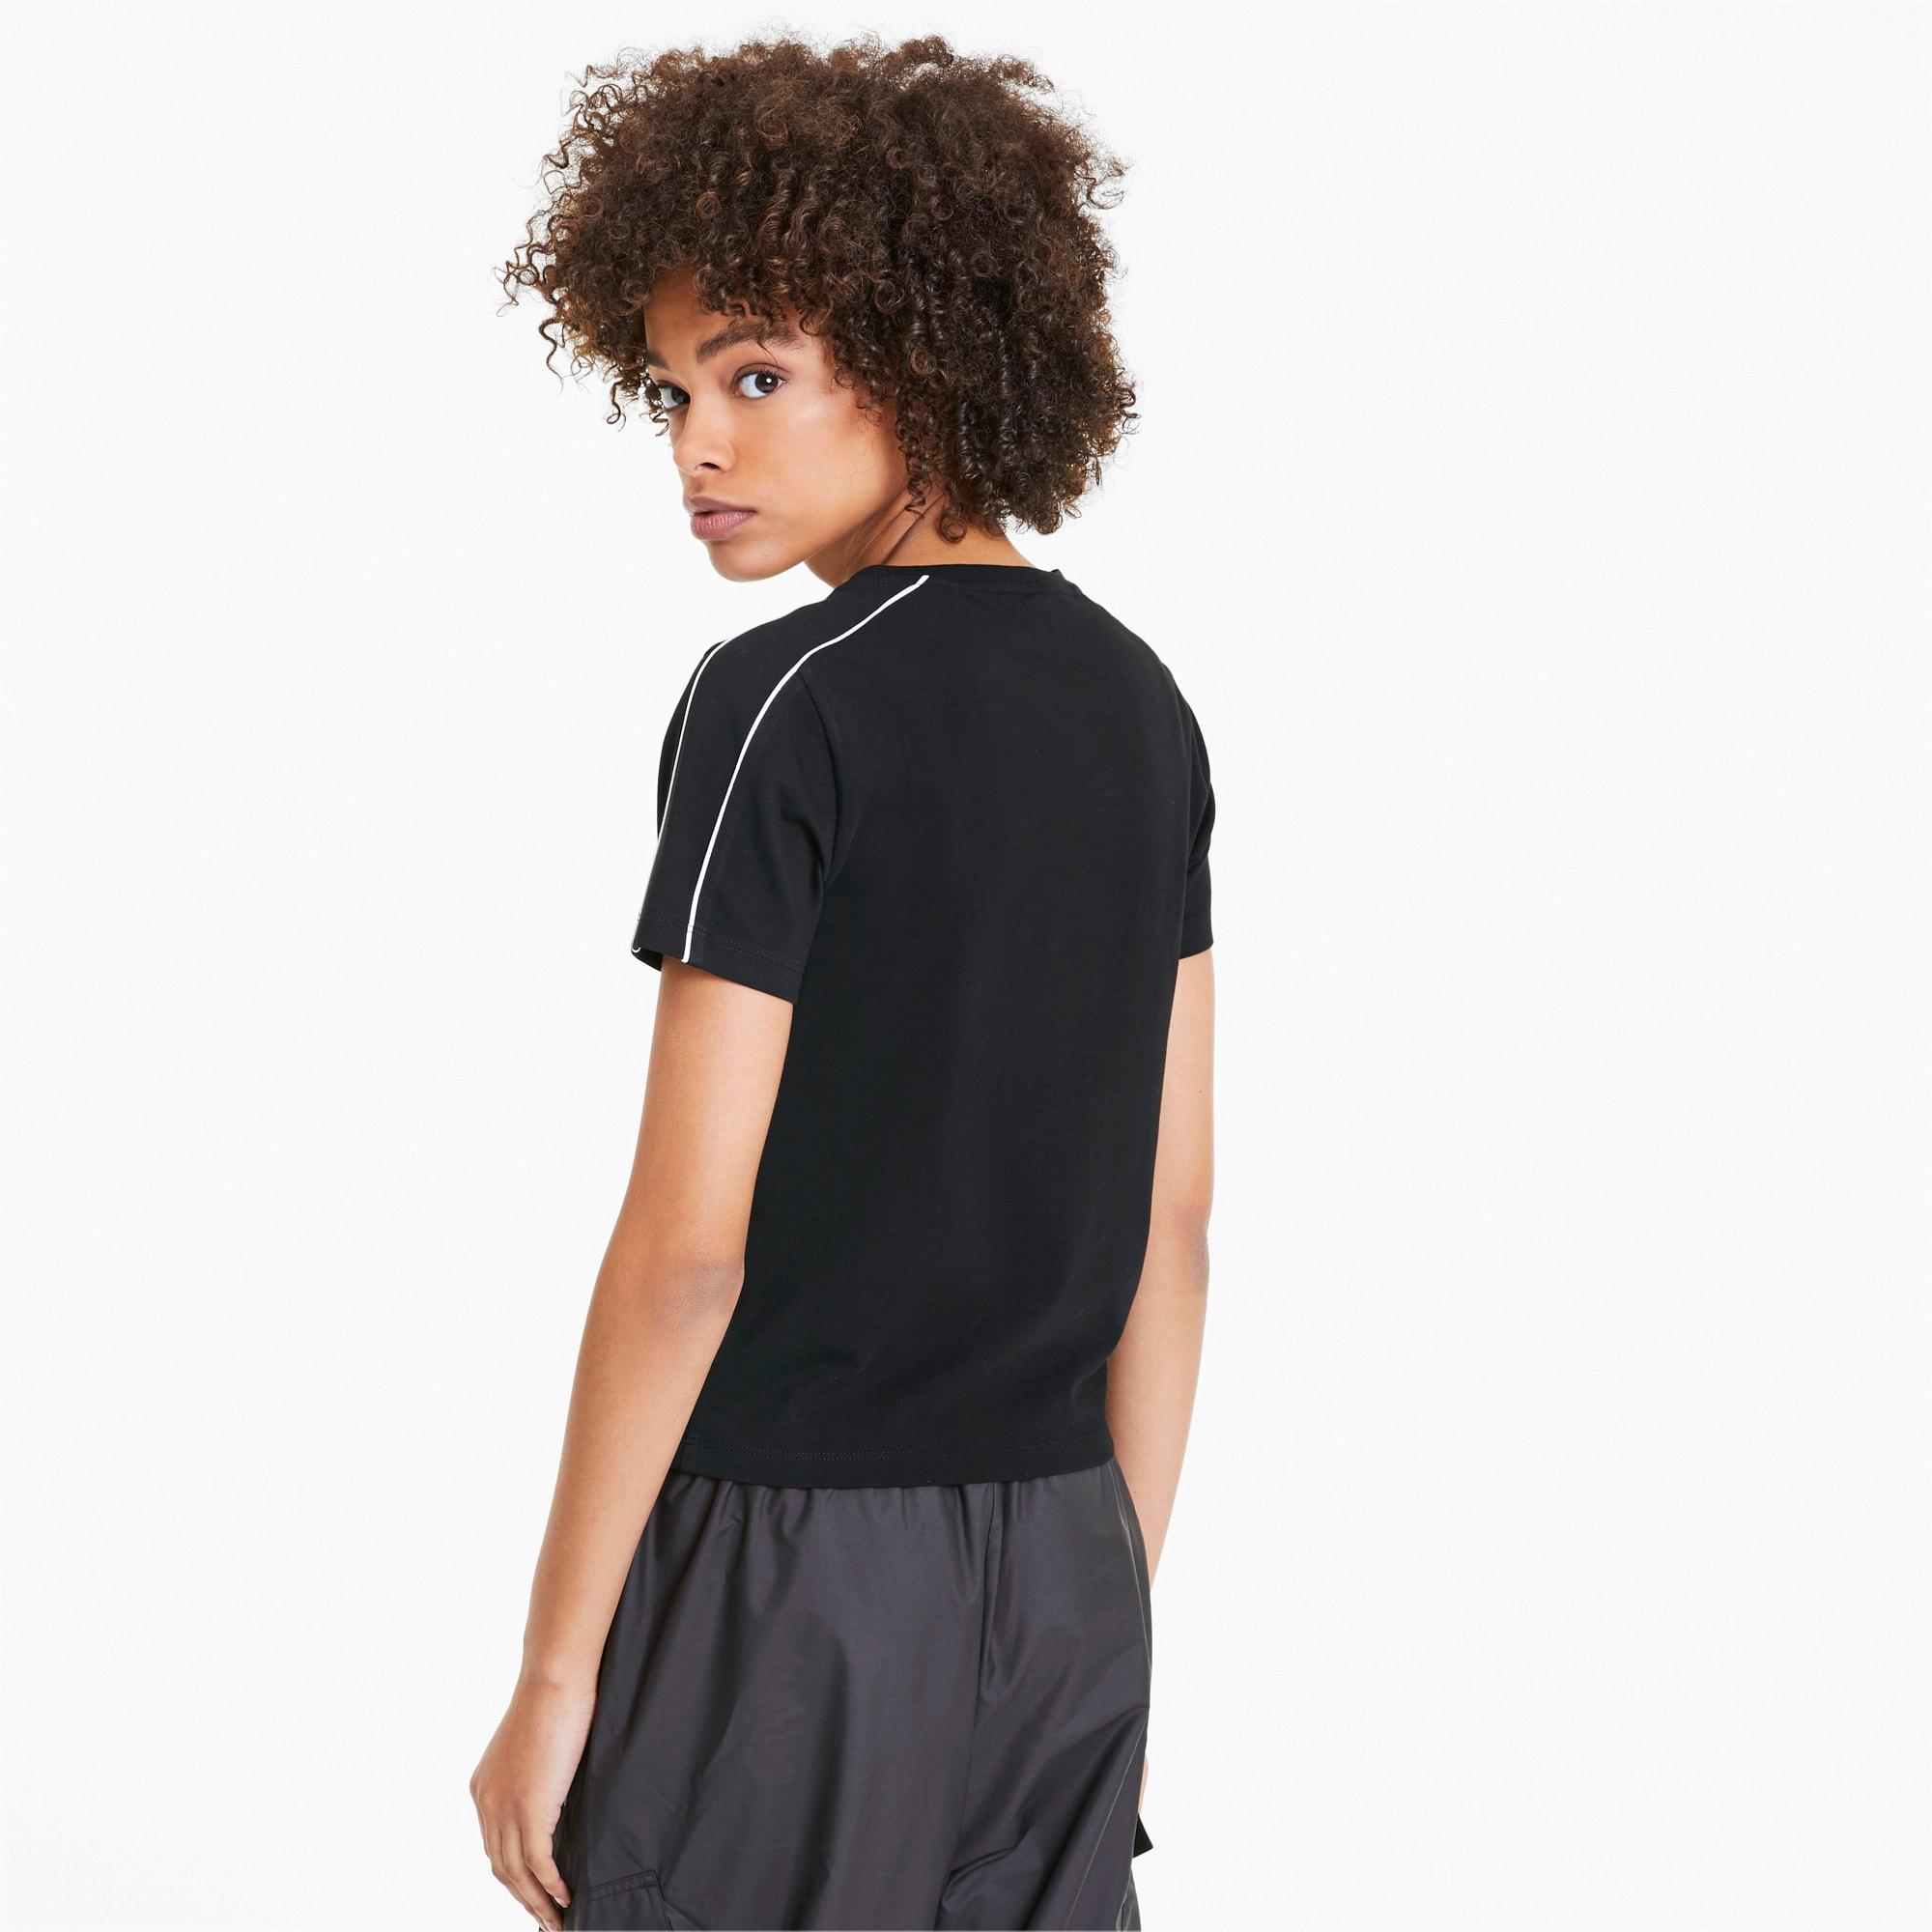 Miniatura 2 de Camiseta Classics Tight para mujer, Puma Black, mediano